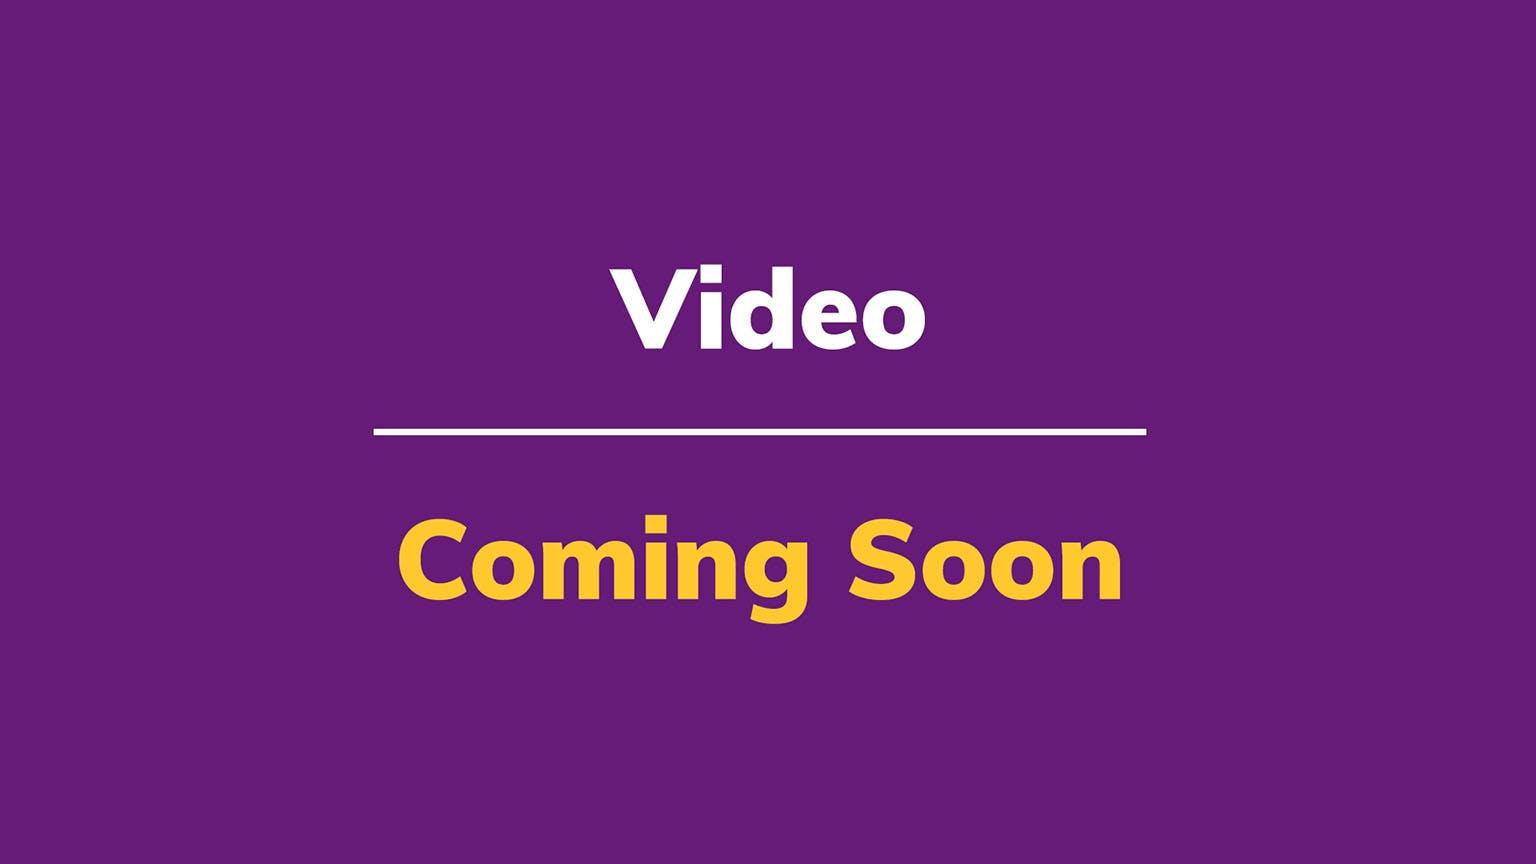 Thumbnail: Video Coming Soon